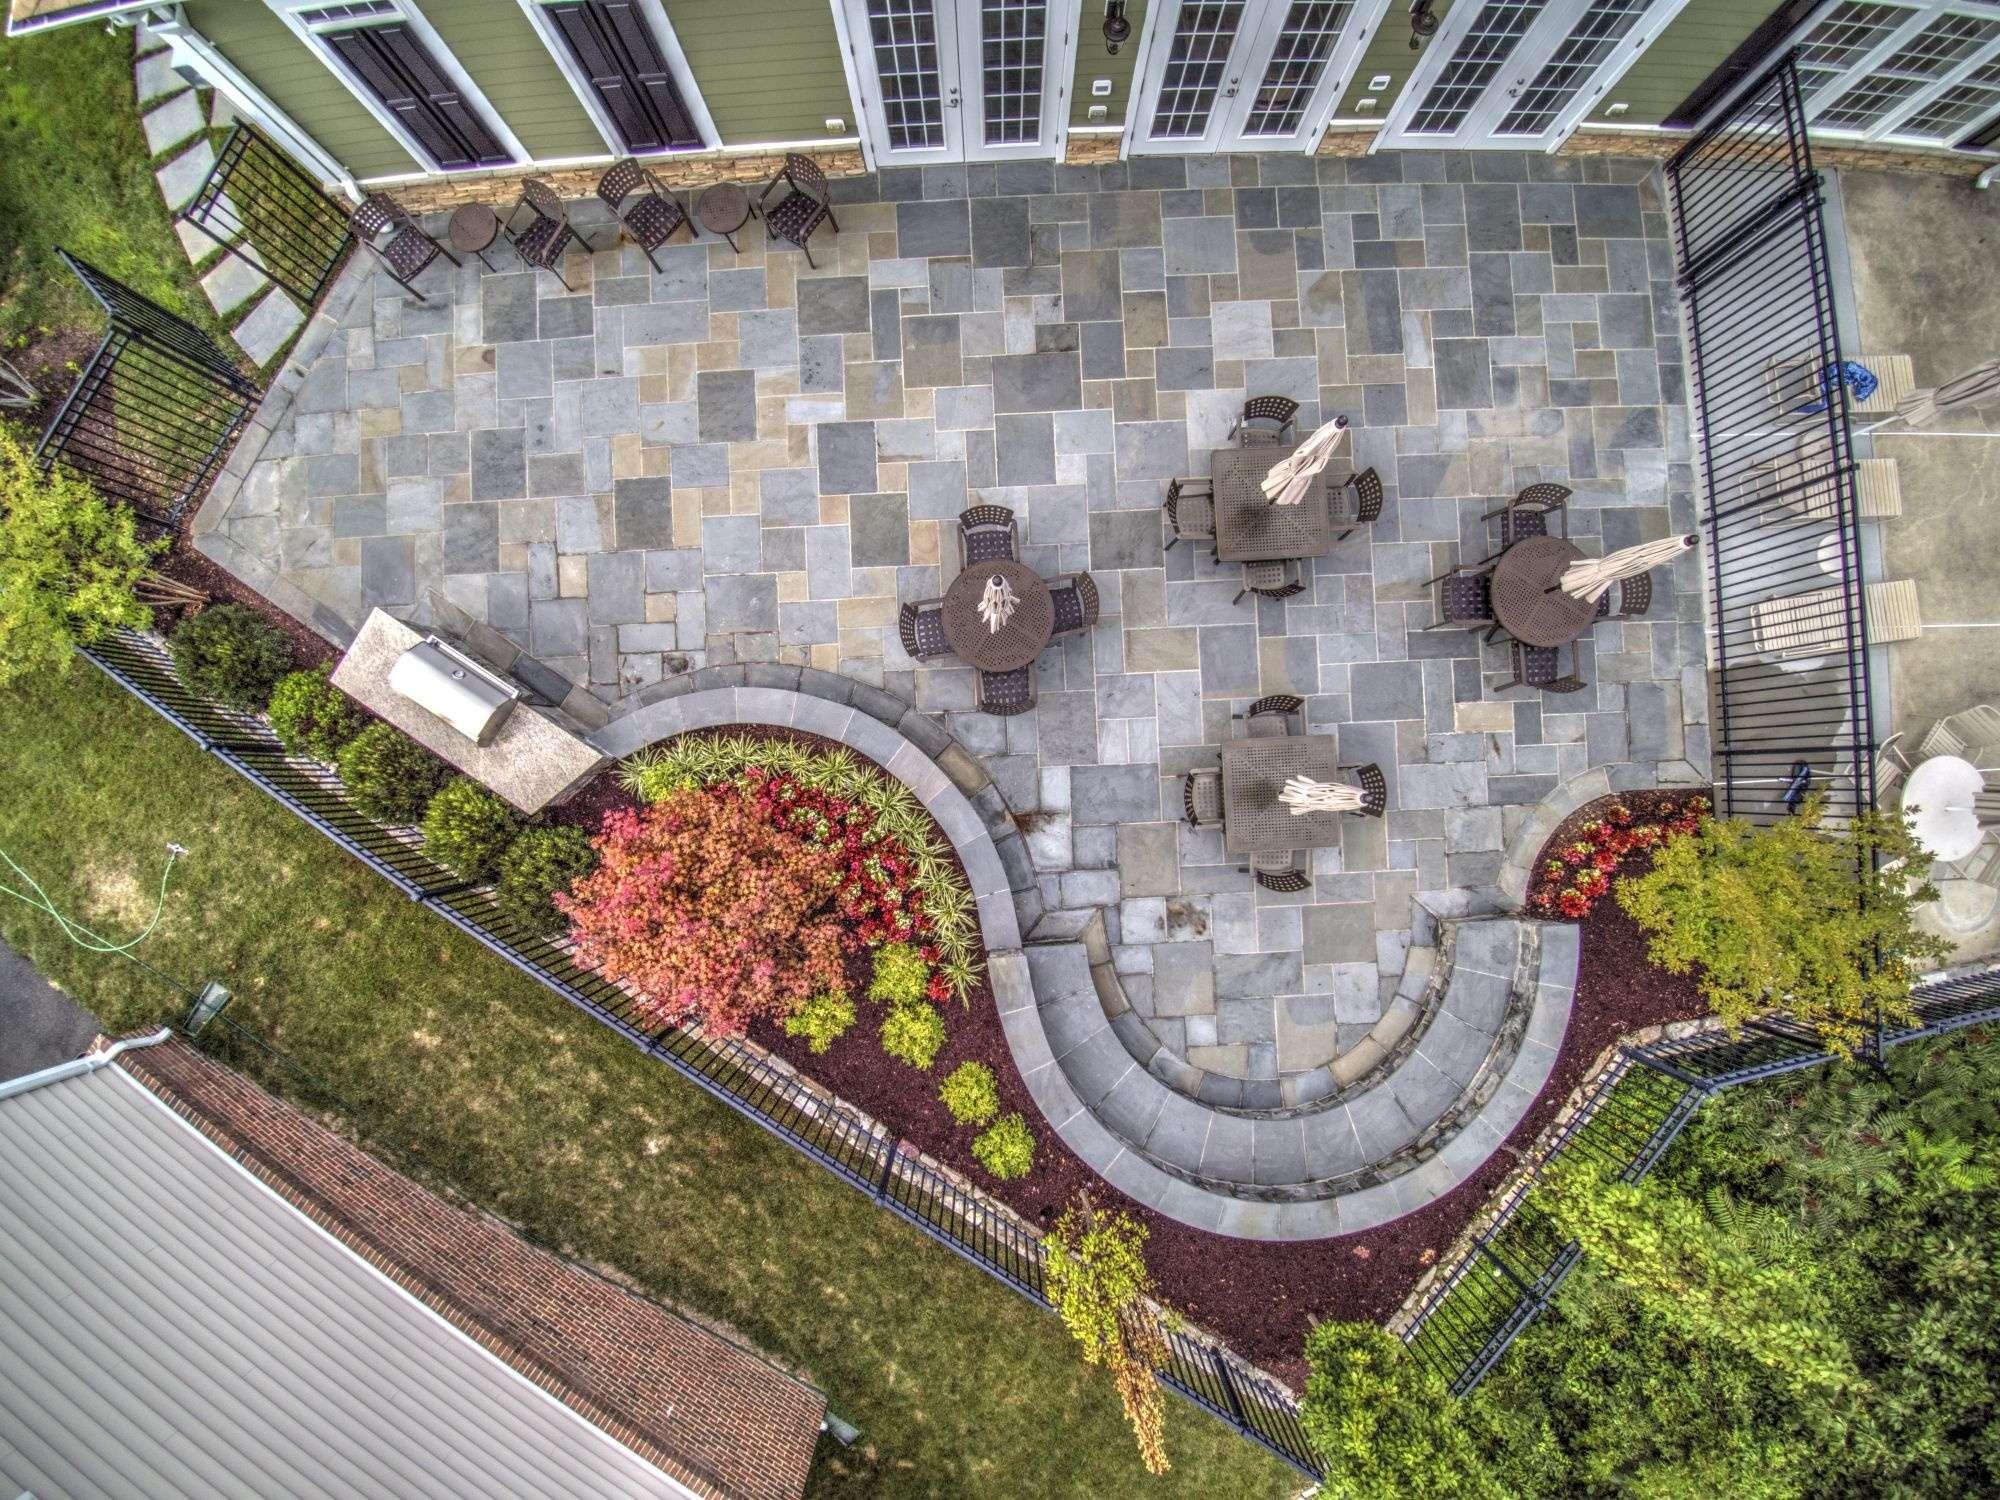 Professional landscape design in Ashburn, Aldie and Leesburg, VA.